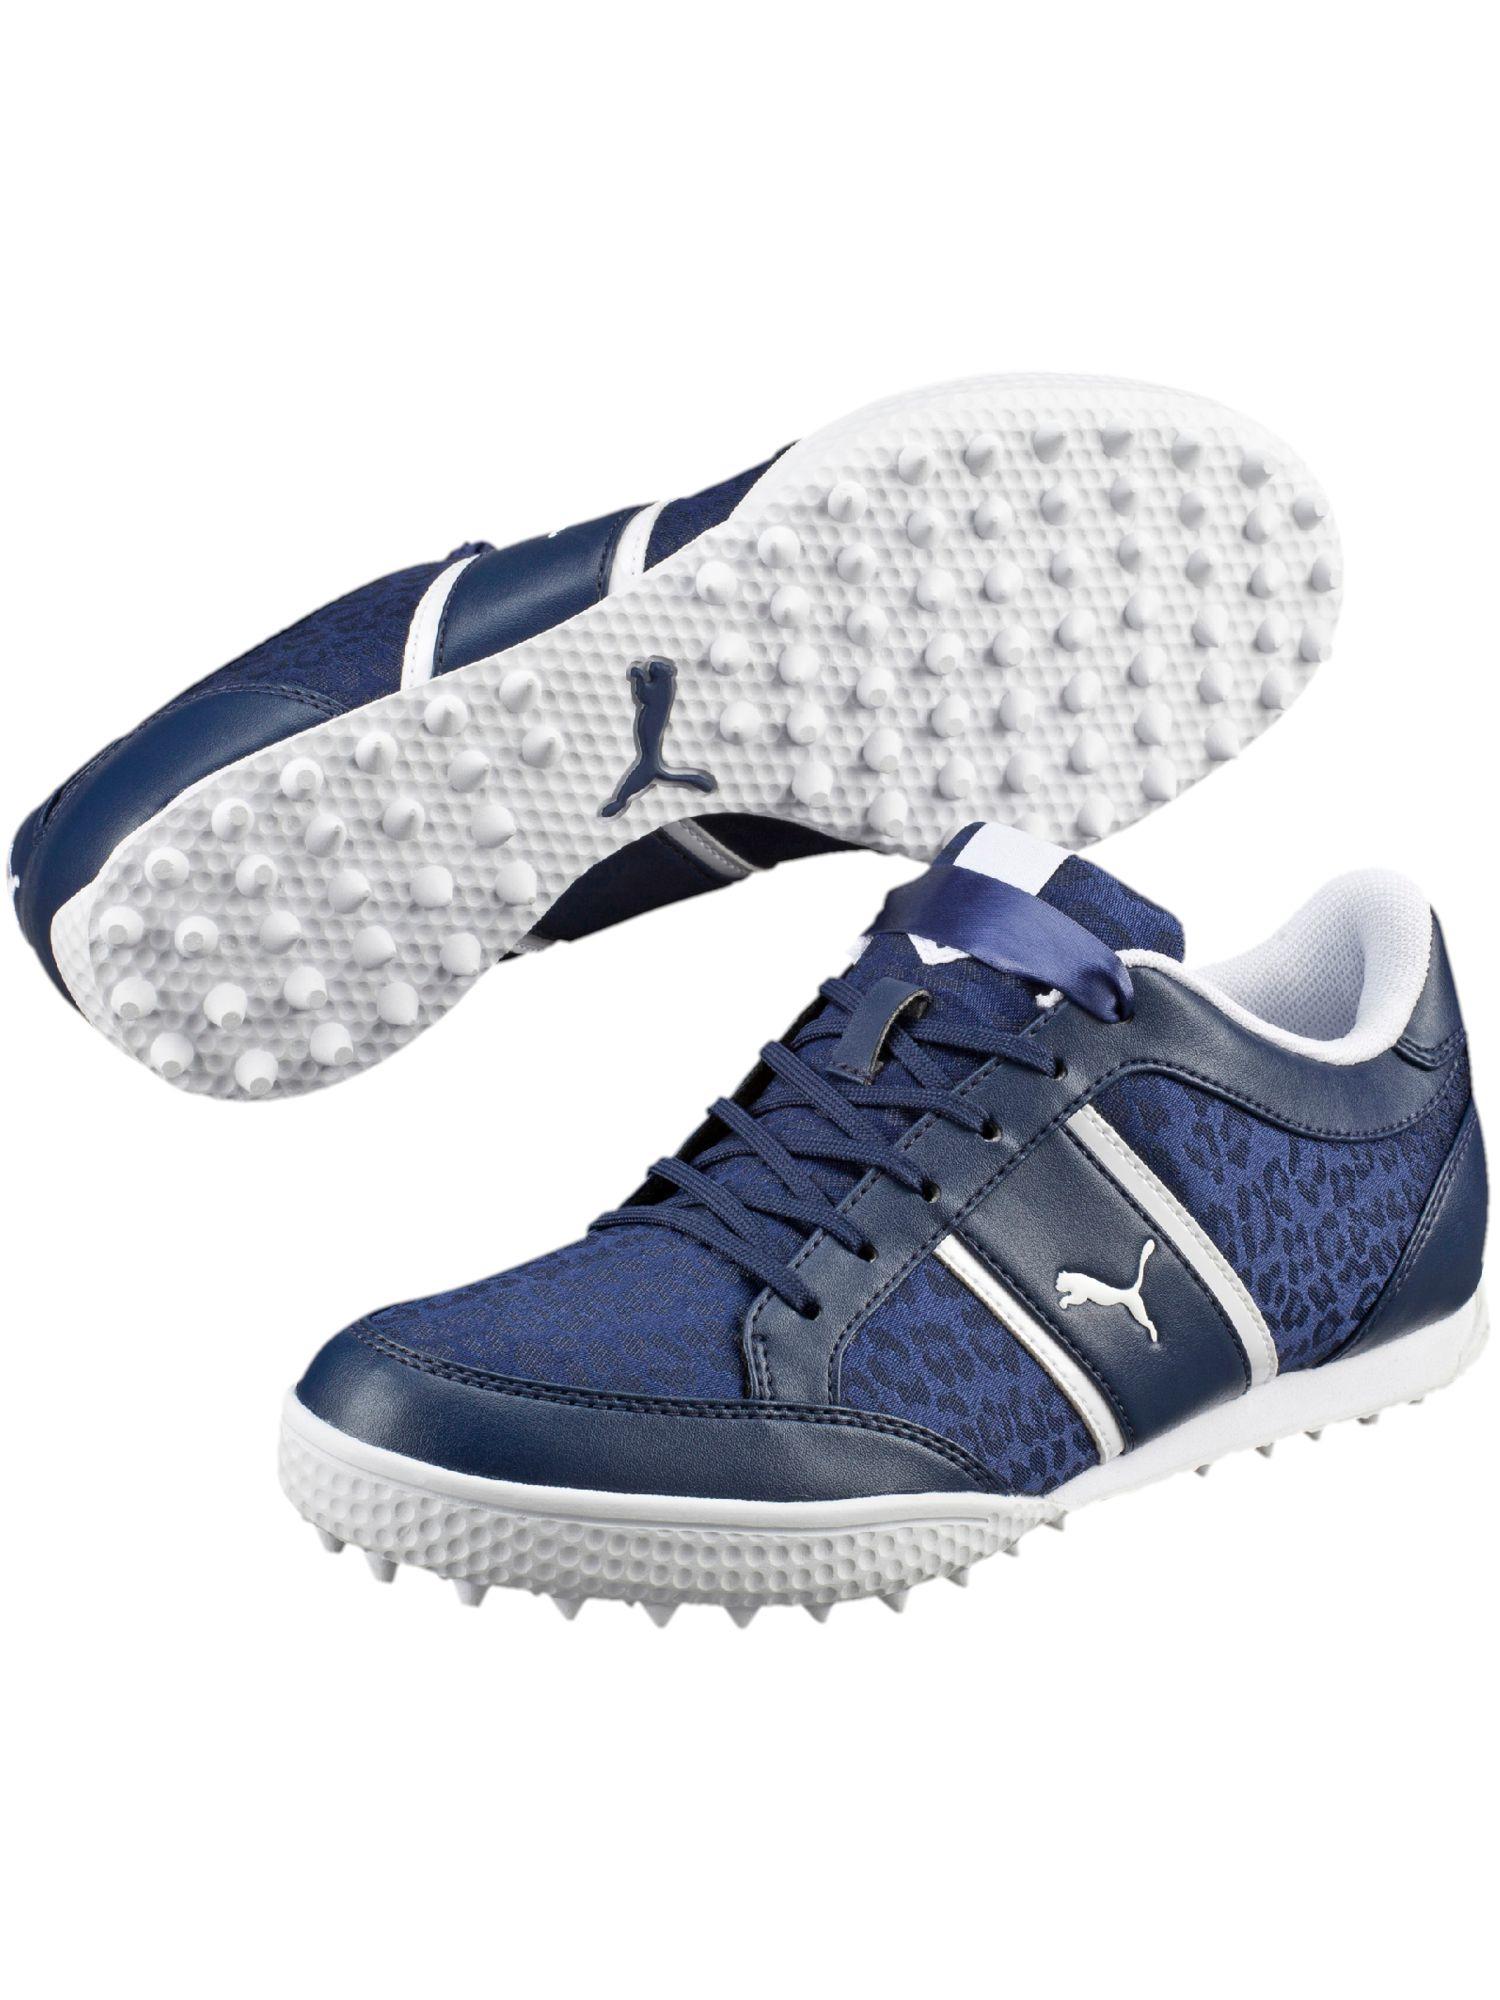 Puma Women S Monolite Cat Golf Shoes